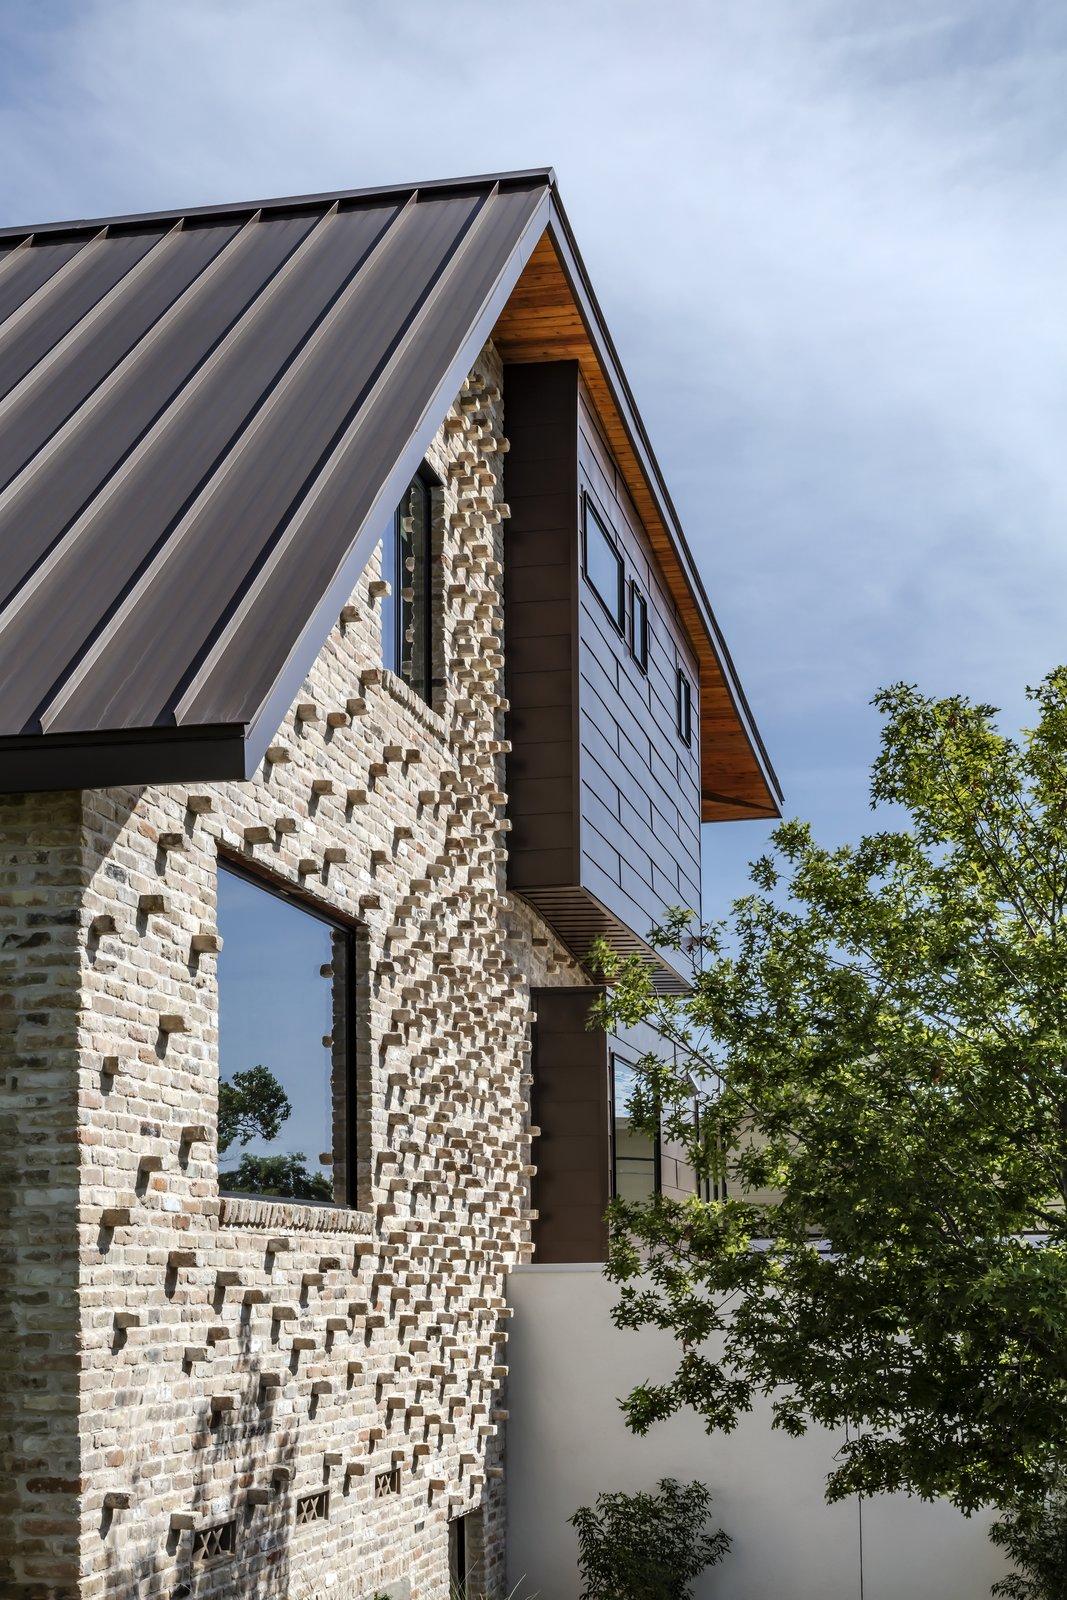 Mullet House brickwork